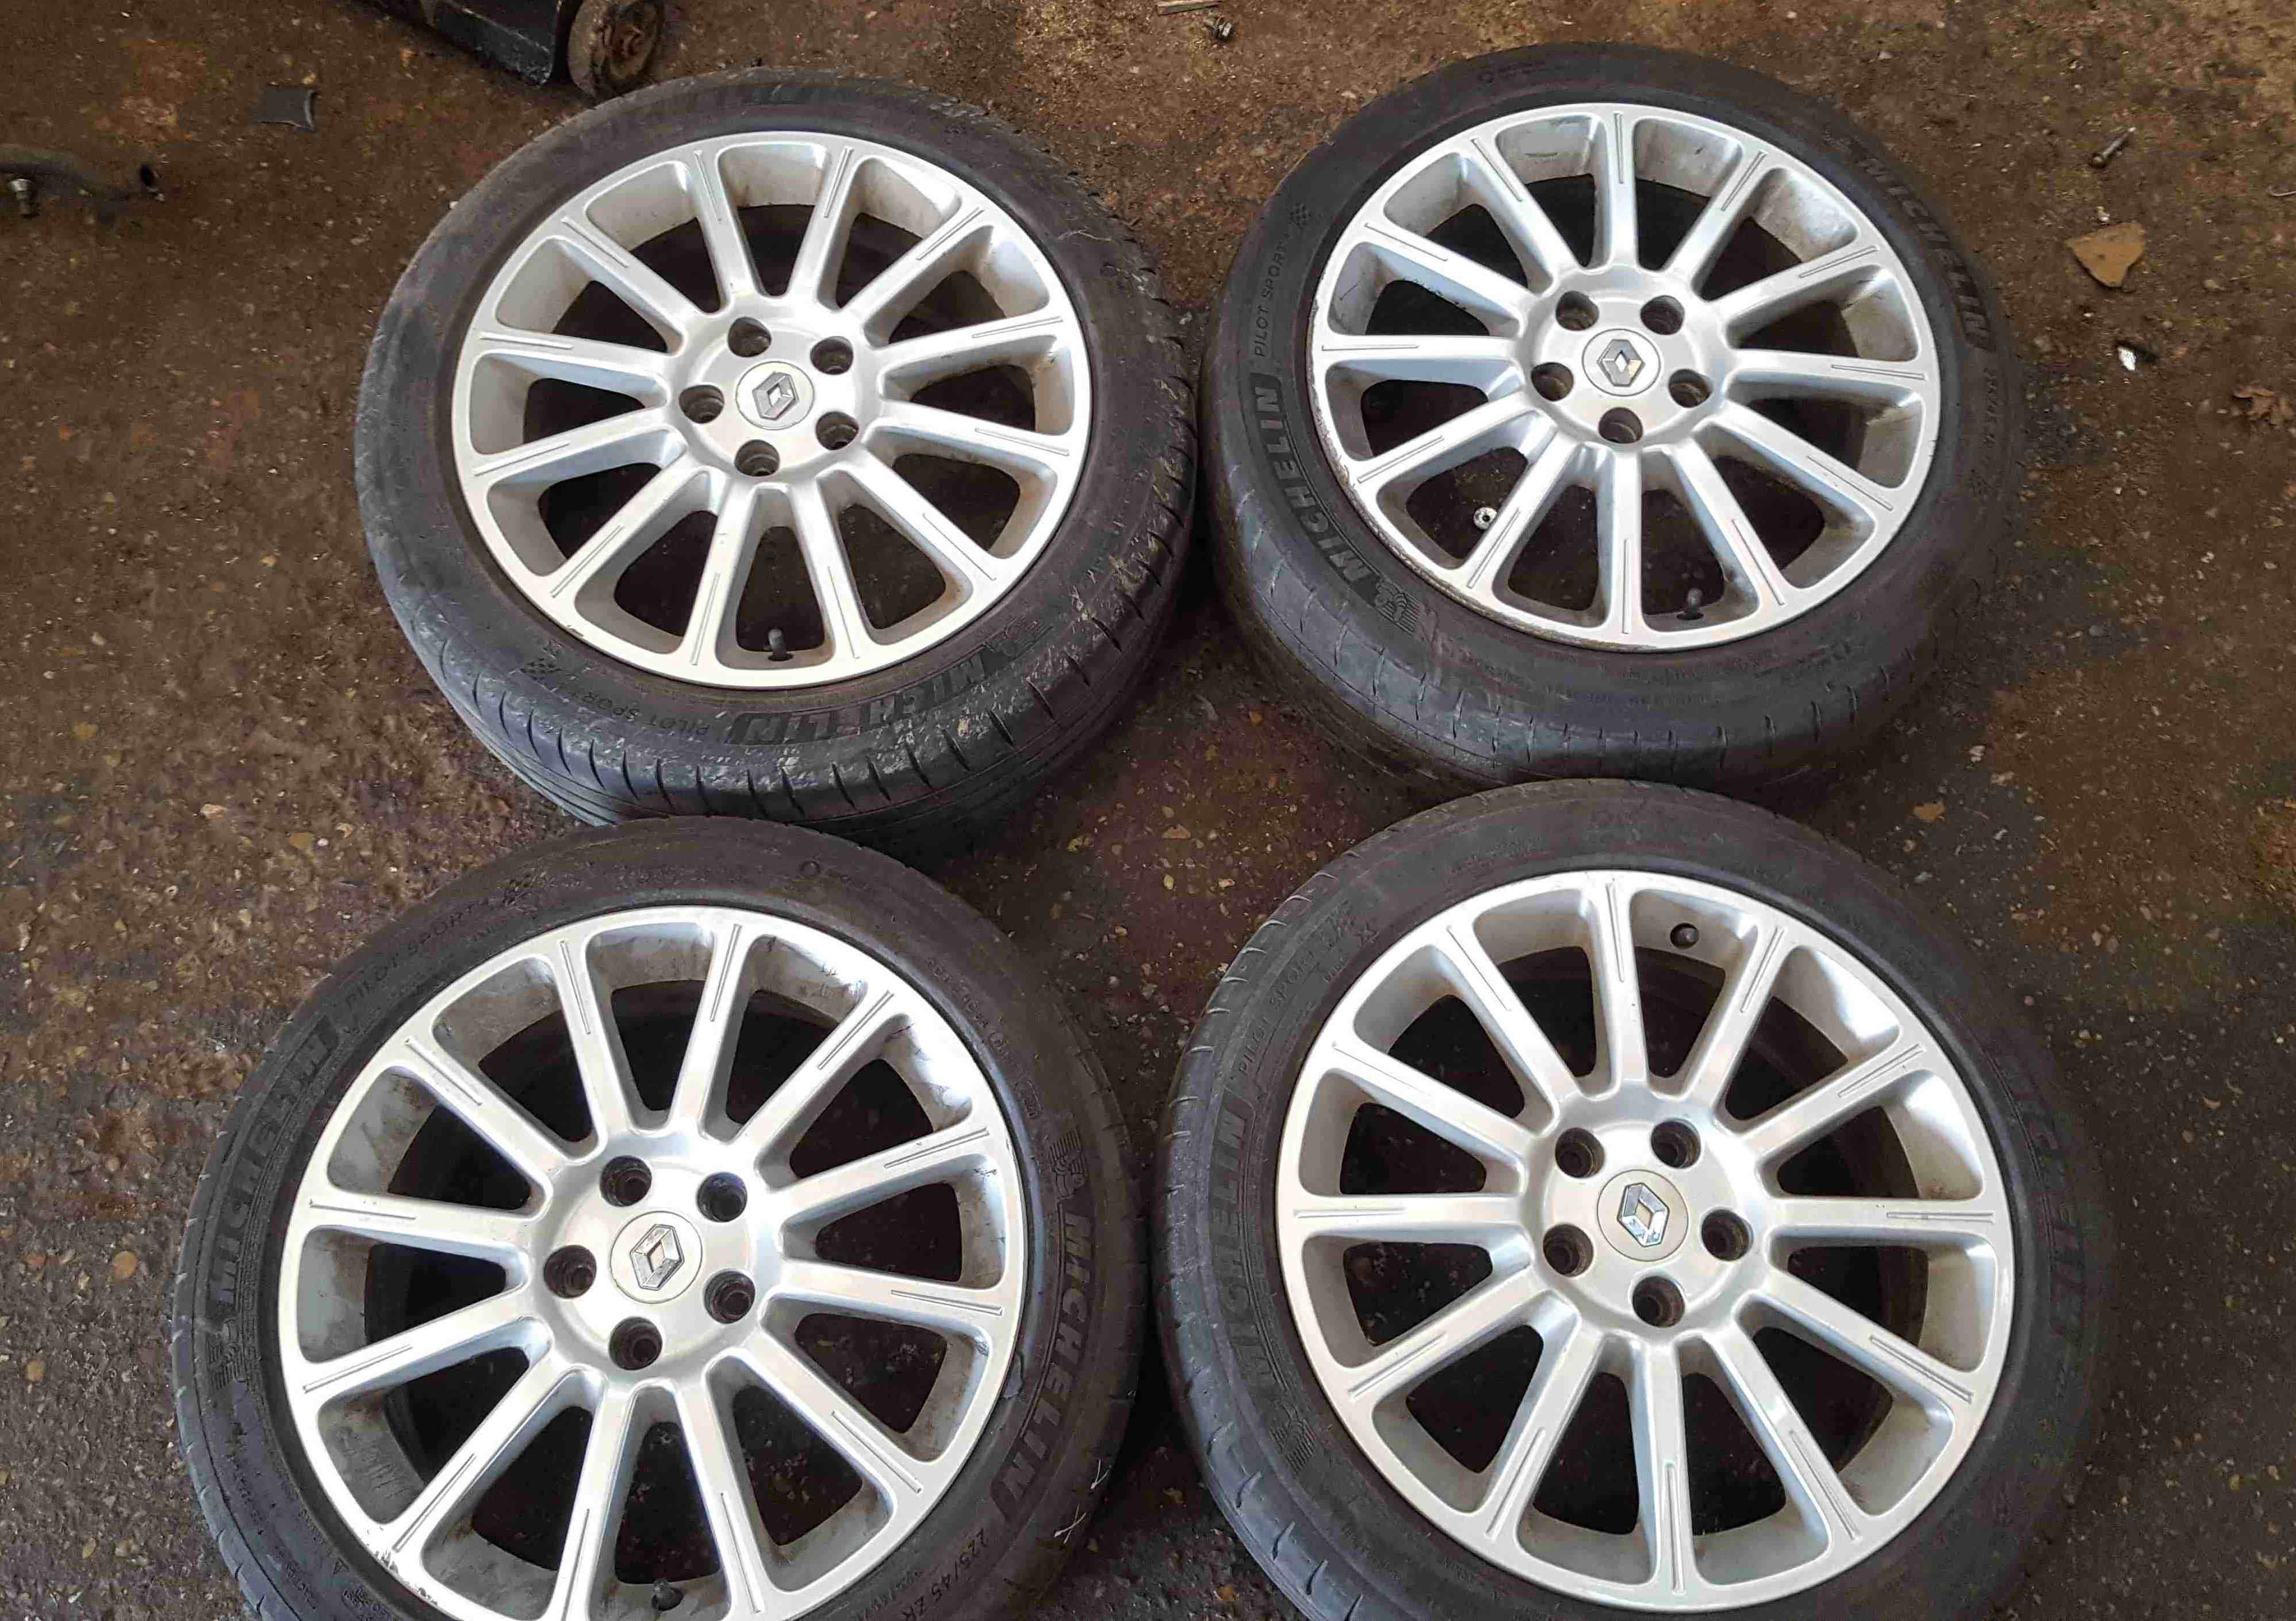 Renault Clio Sport MK3 20052012 197 200 Alloy Wheels Set X4 17inch 8200667039